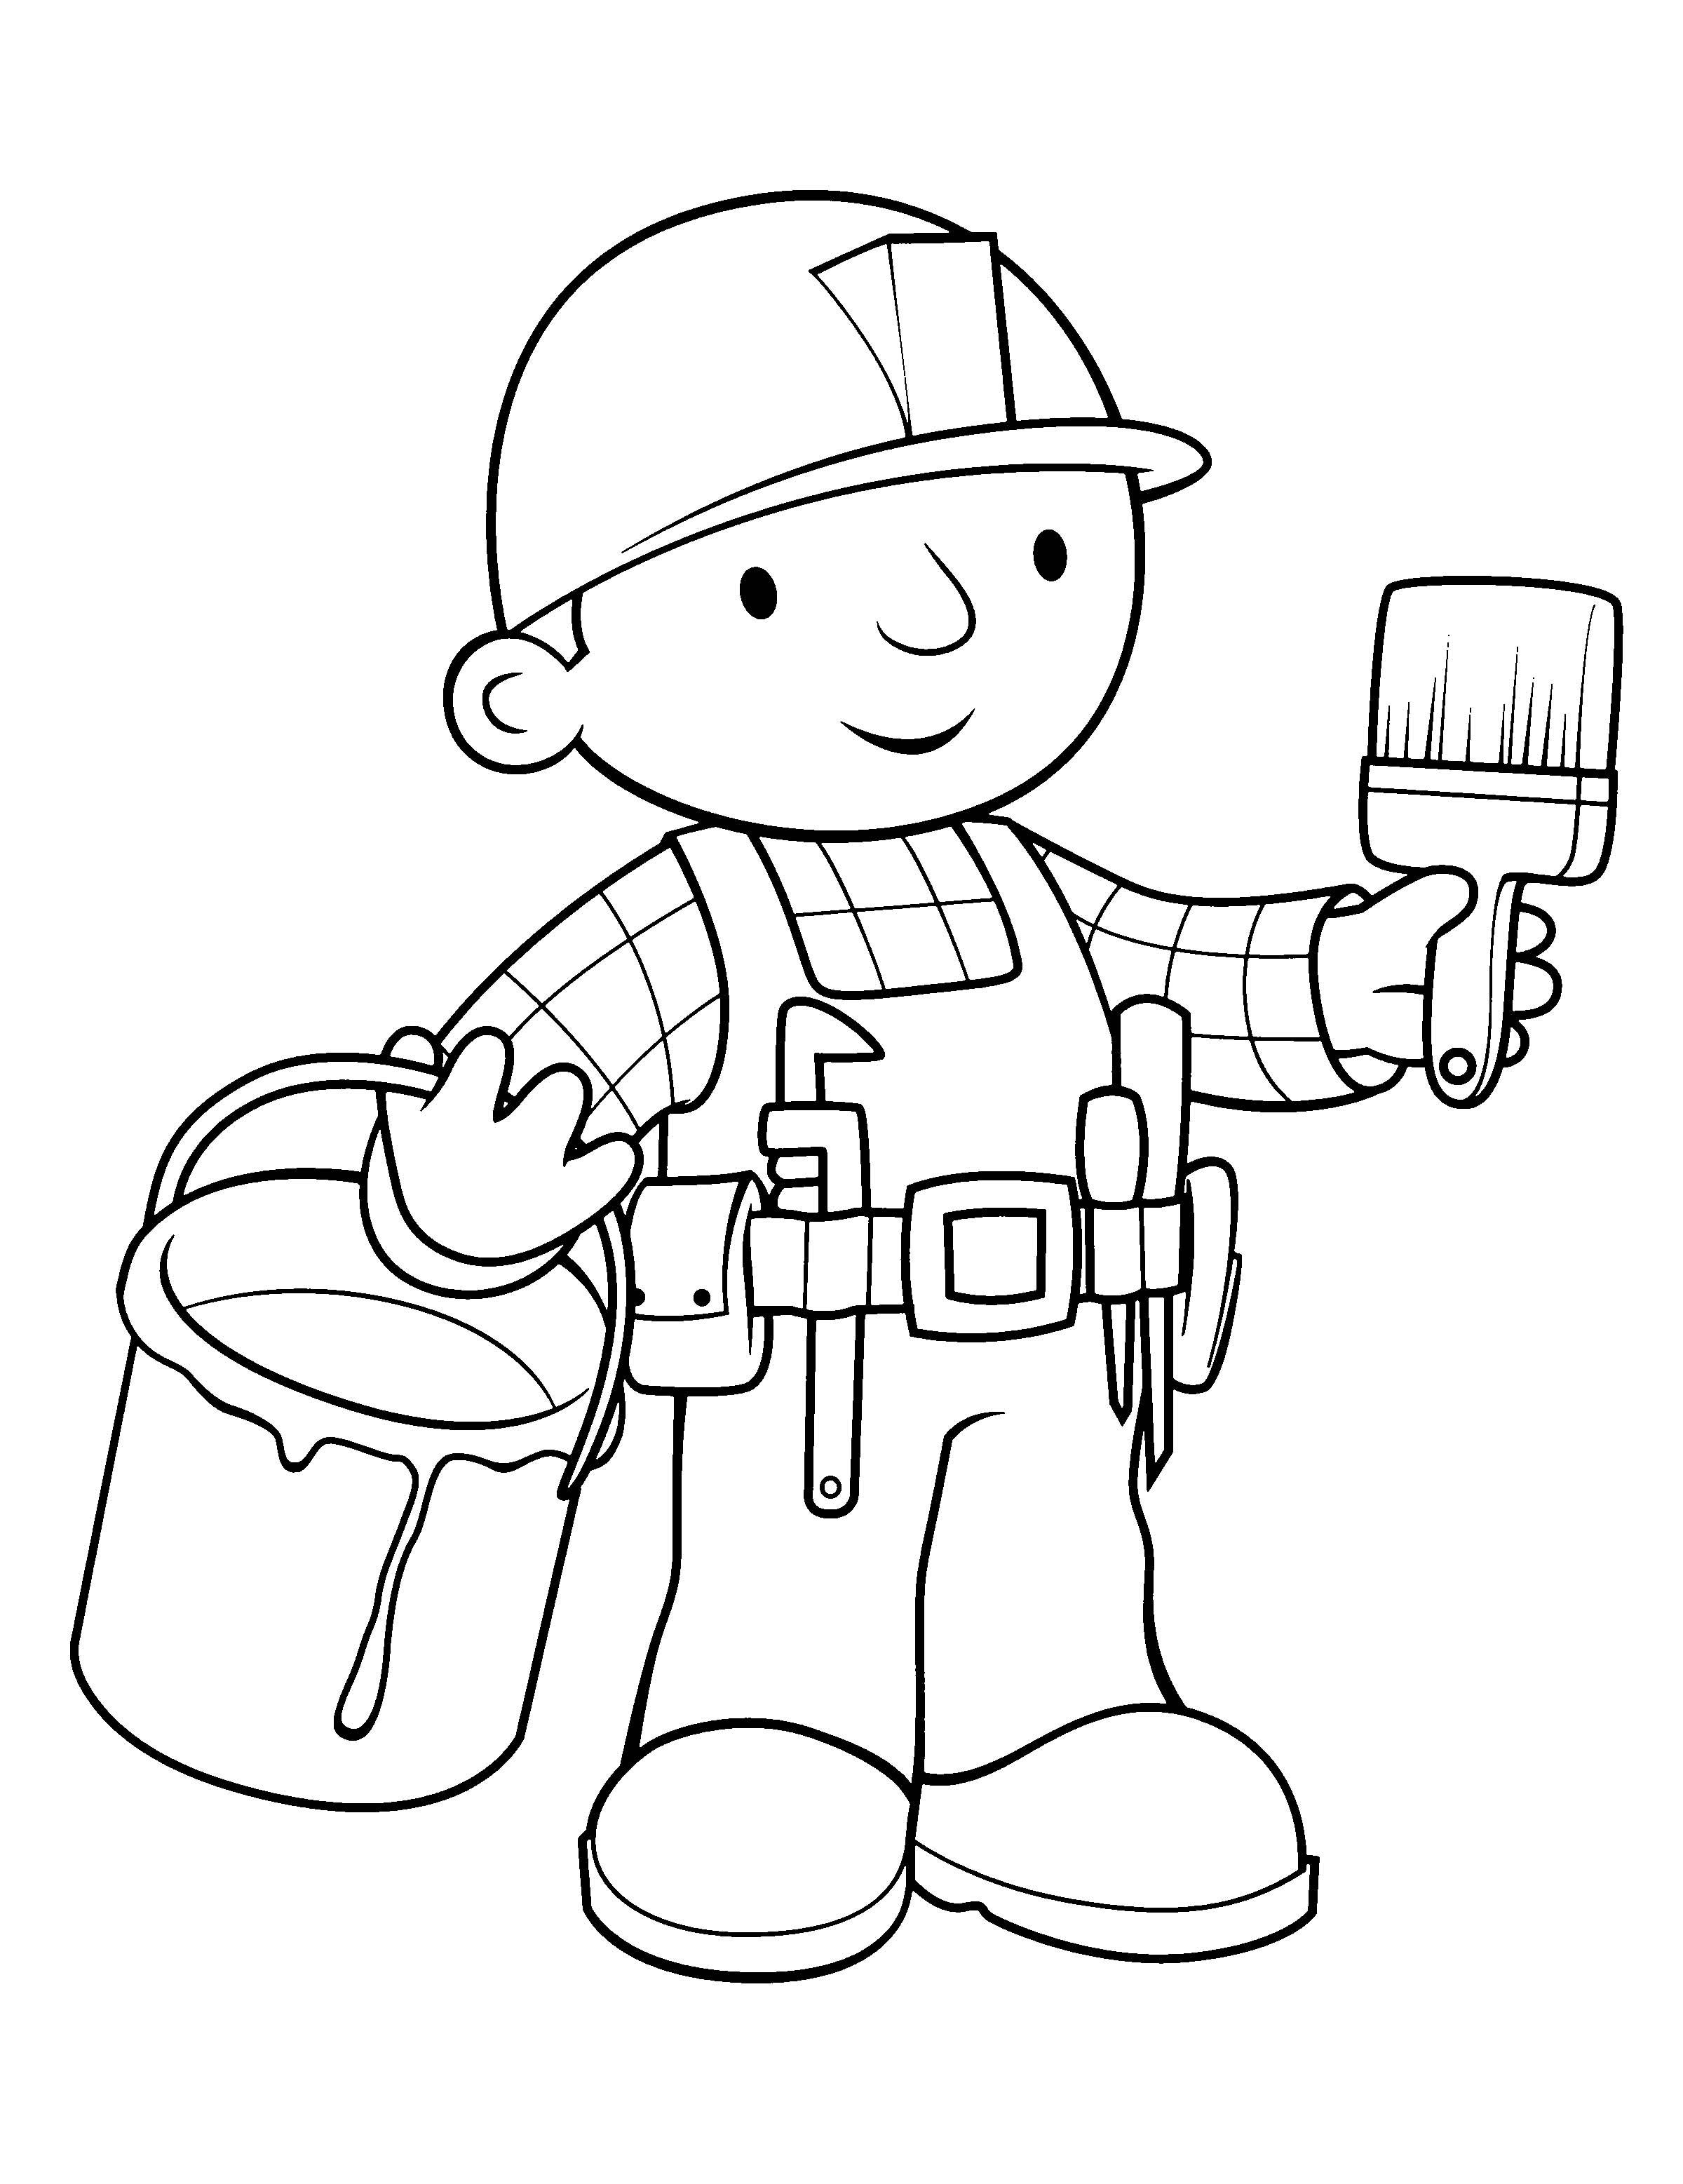 Bob The Builder Drawing At Getdrawings